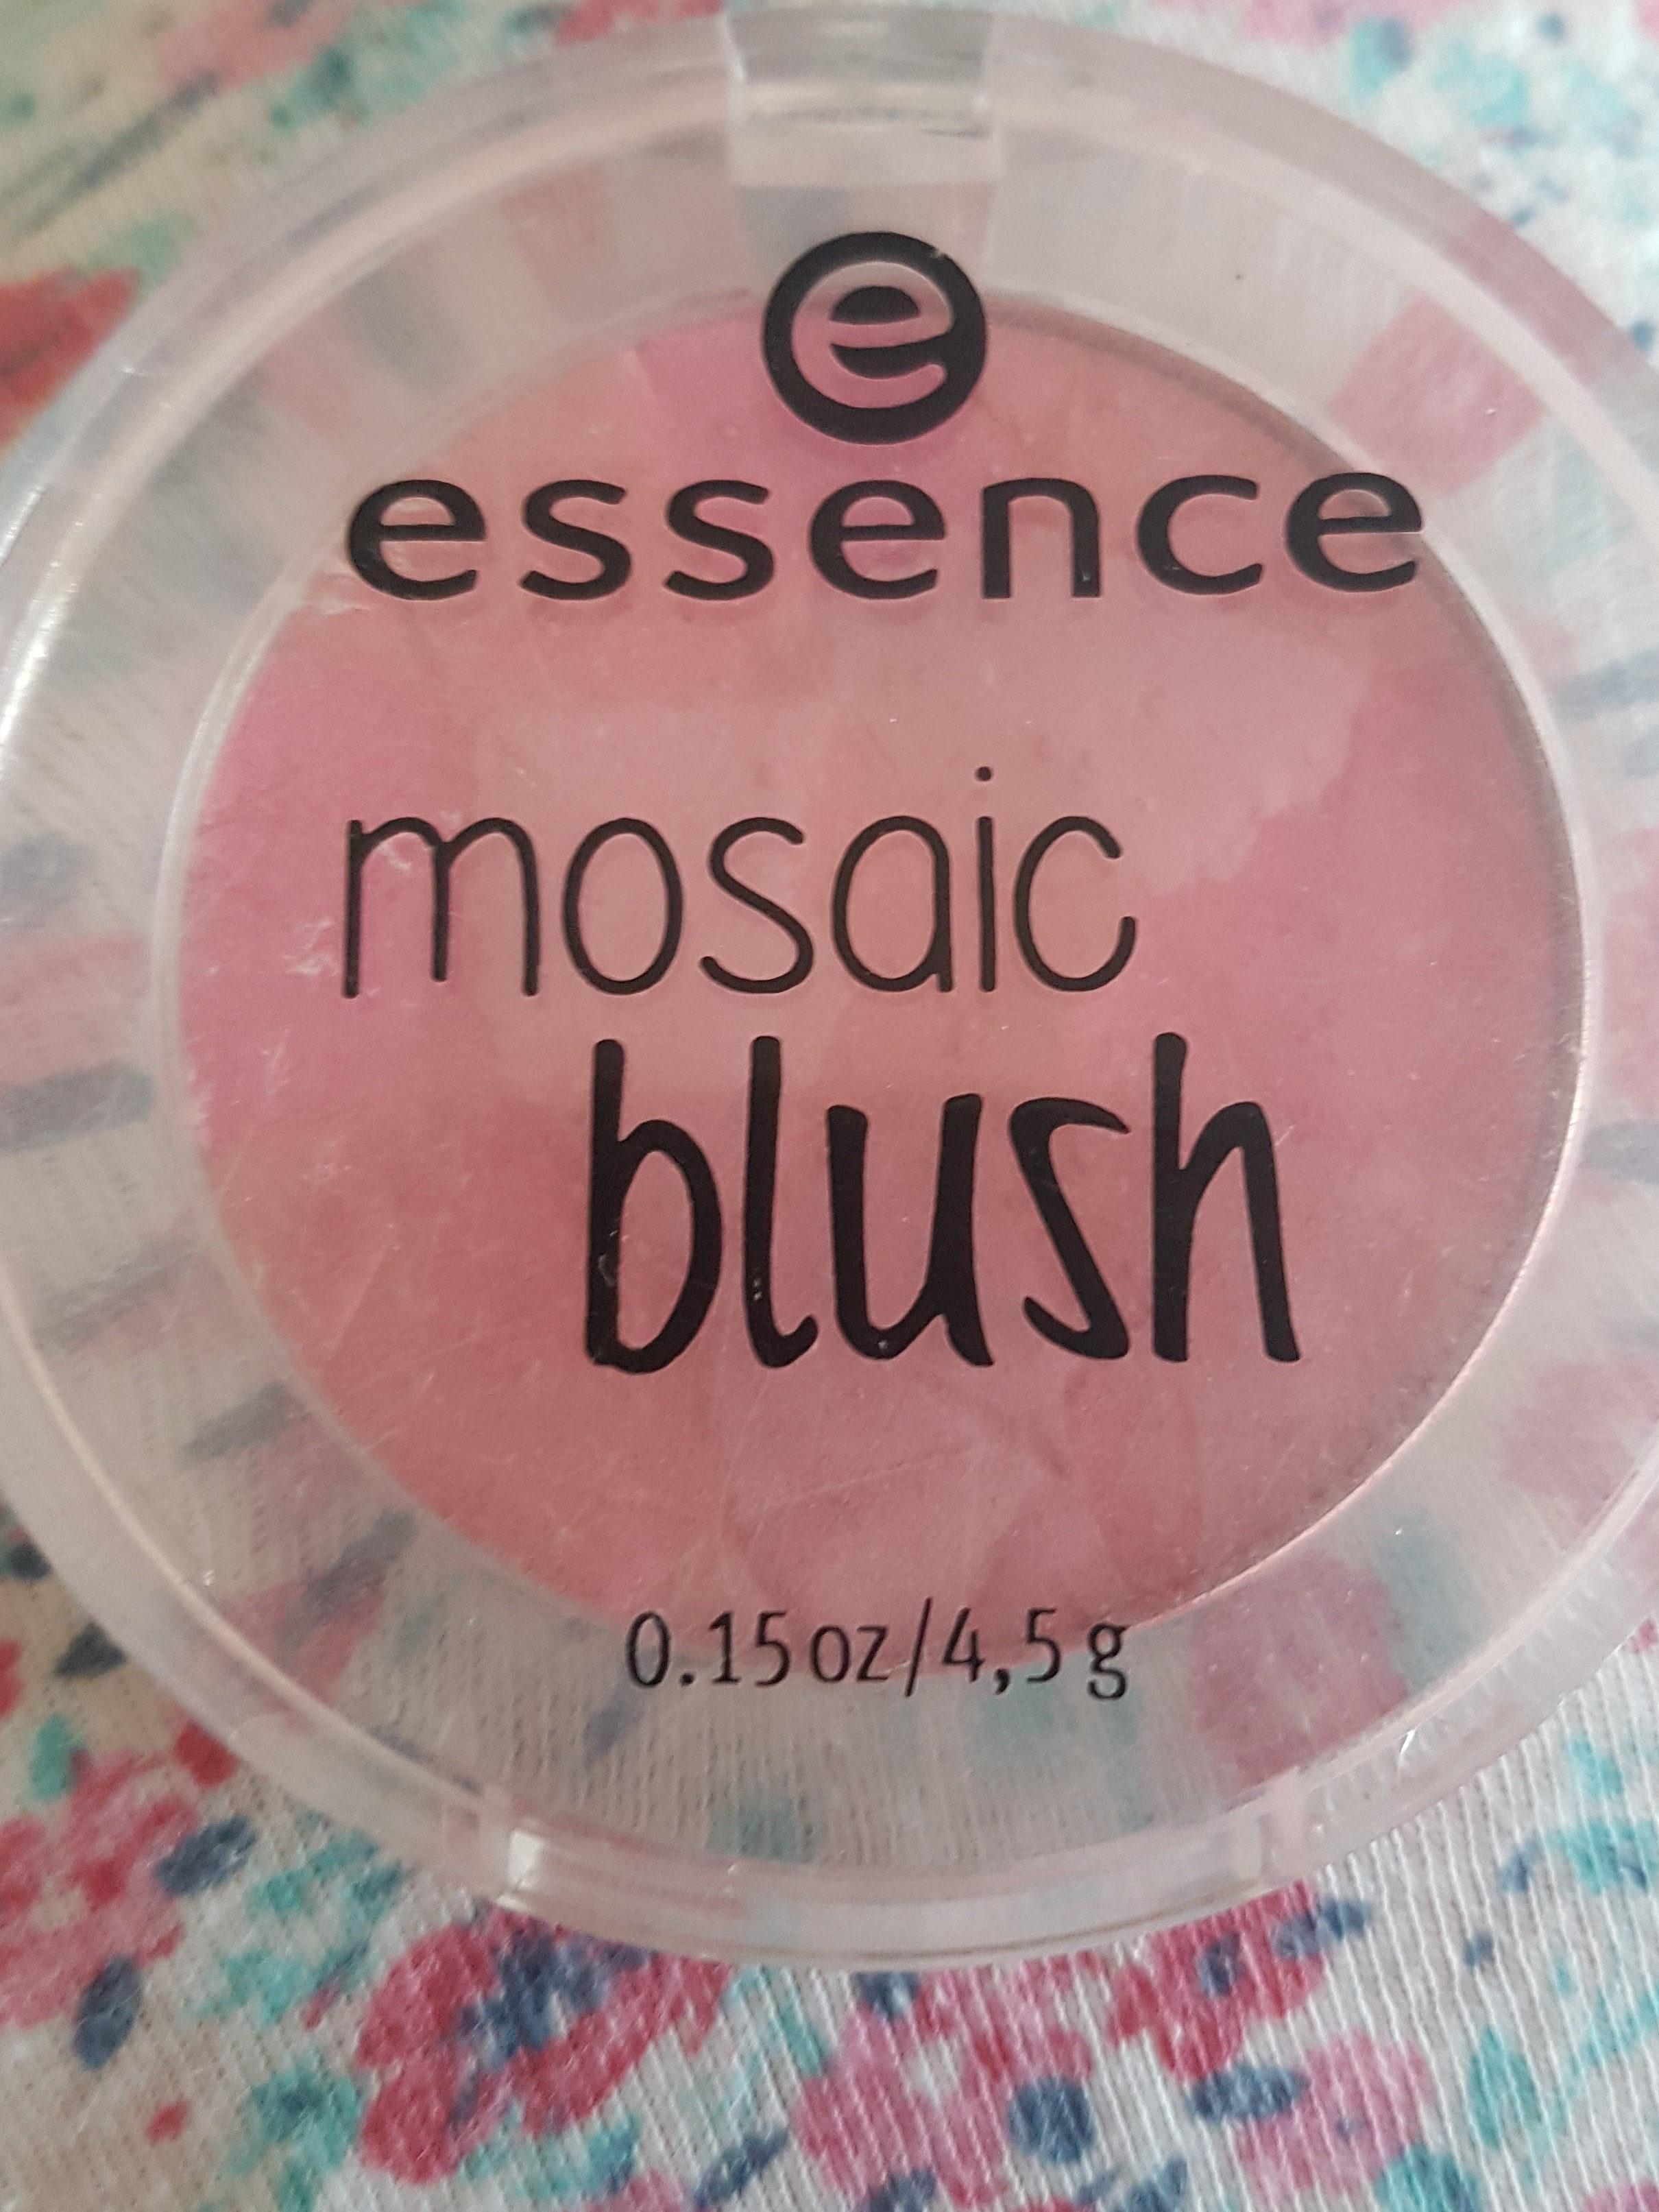 essence mosaic blush - Product